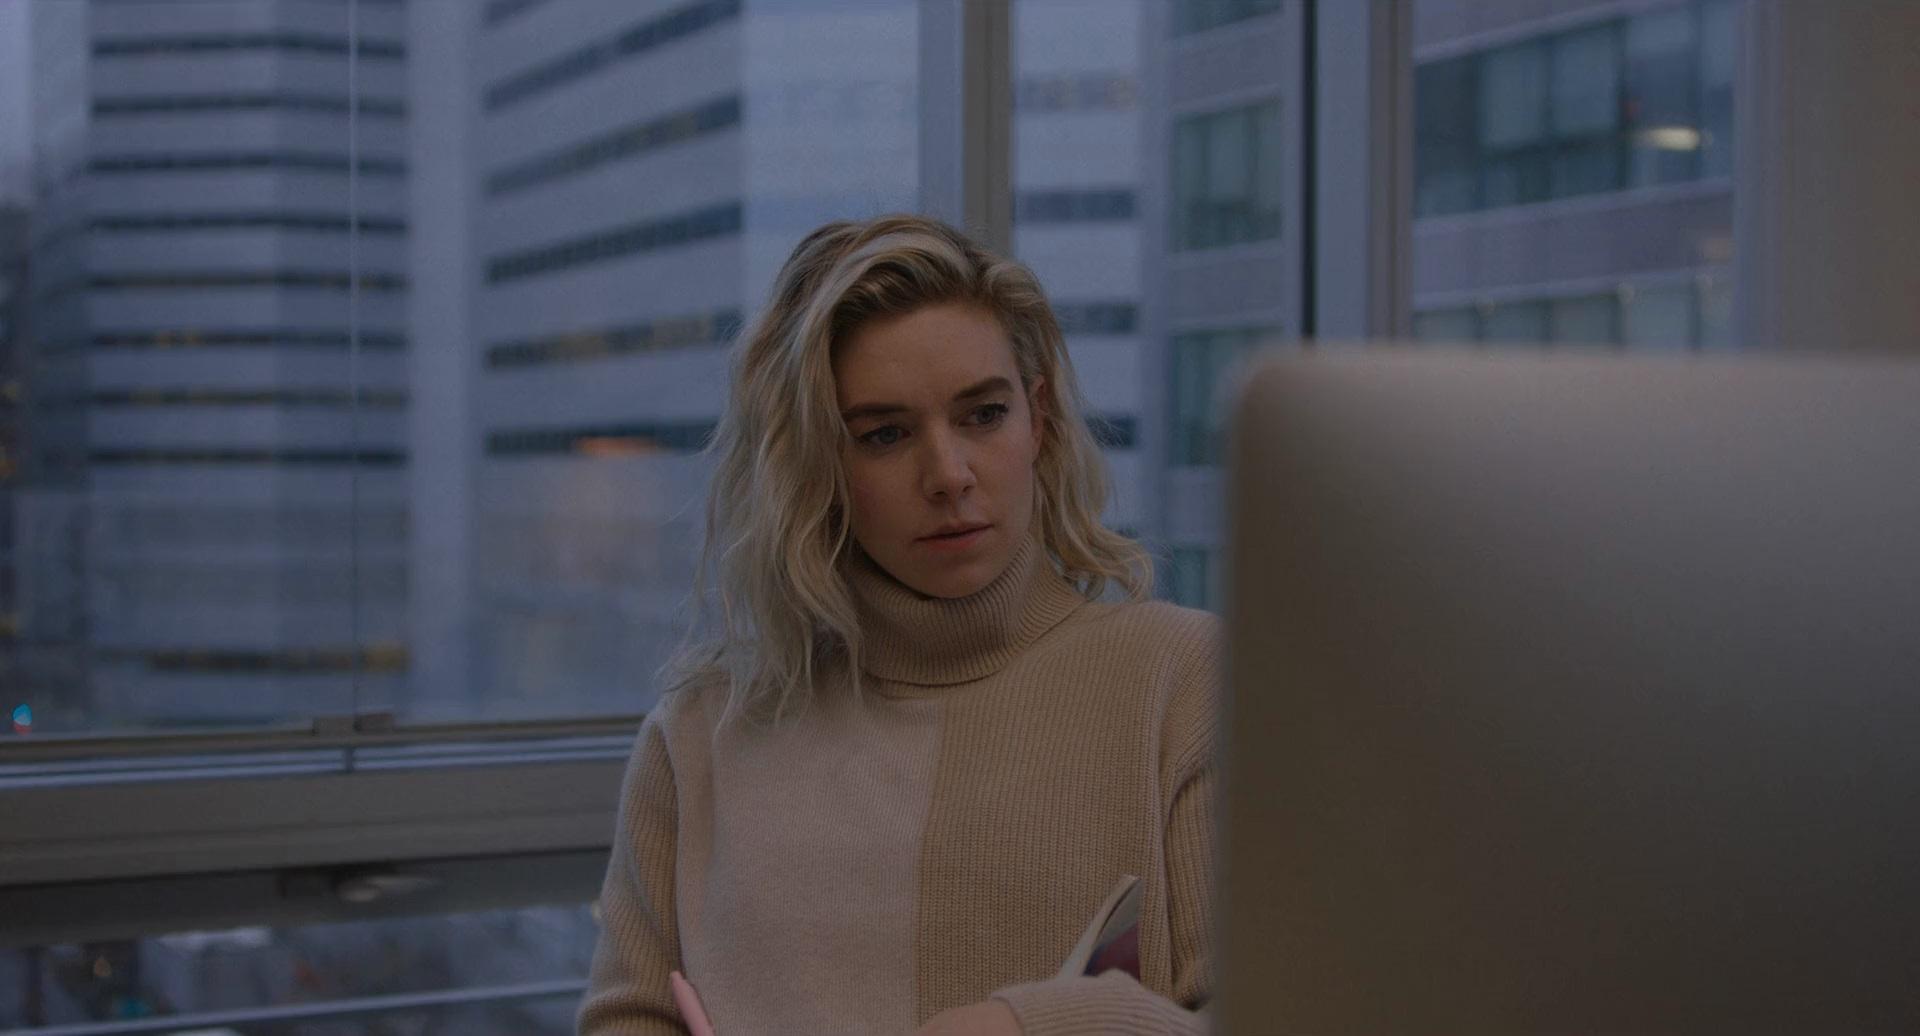 Bir Kadının Parçaları   Pieces of a Woman   2021   WEB-DL   XviD   Türkçe Dublaj   m720p - m1080p   WEB-DL   Dual   TR-EN   Tek Link